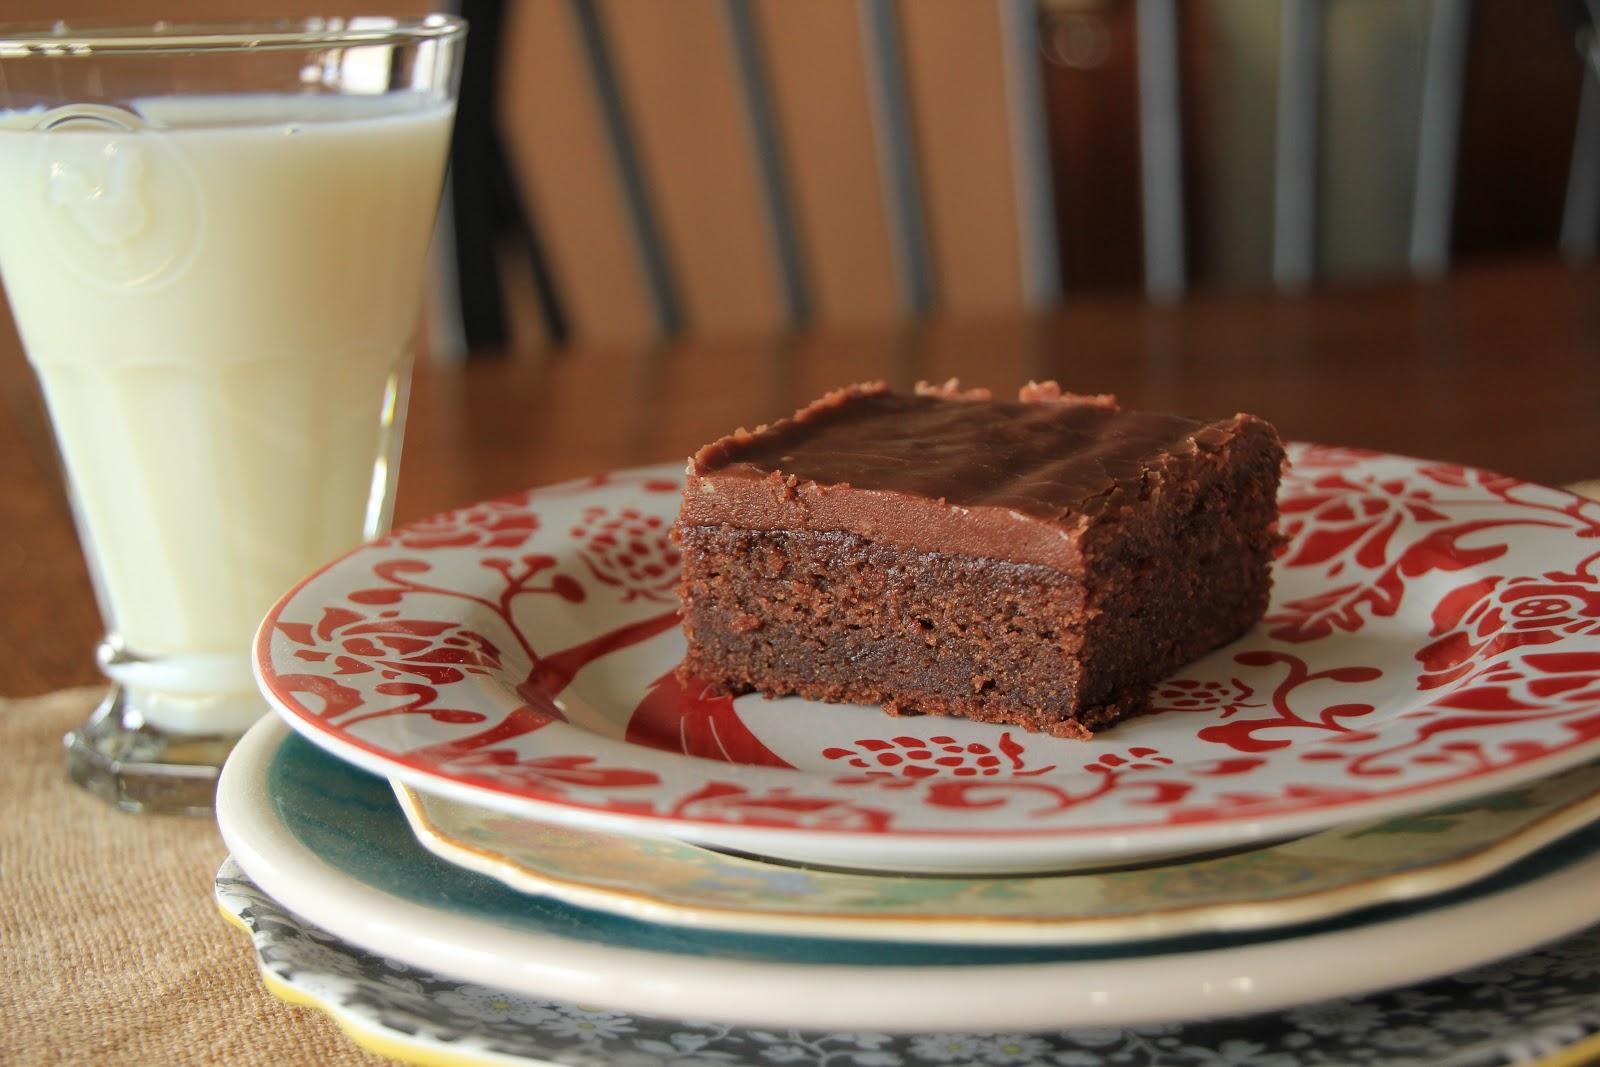 coca-cola cake (a.k.a. the best chocolate cake ever)